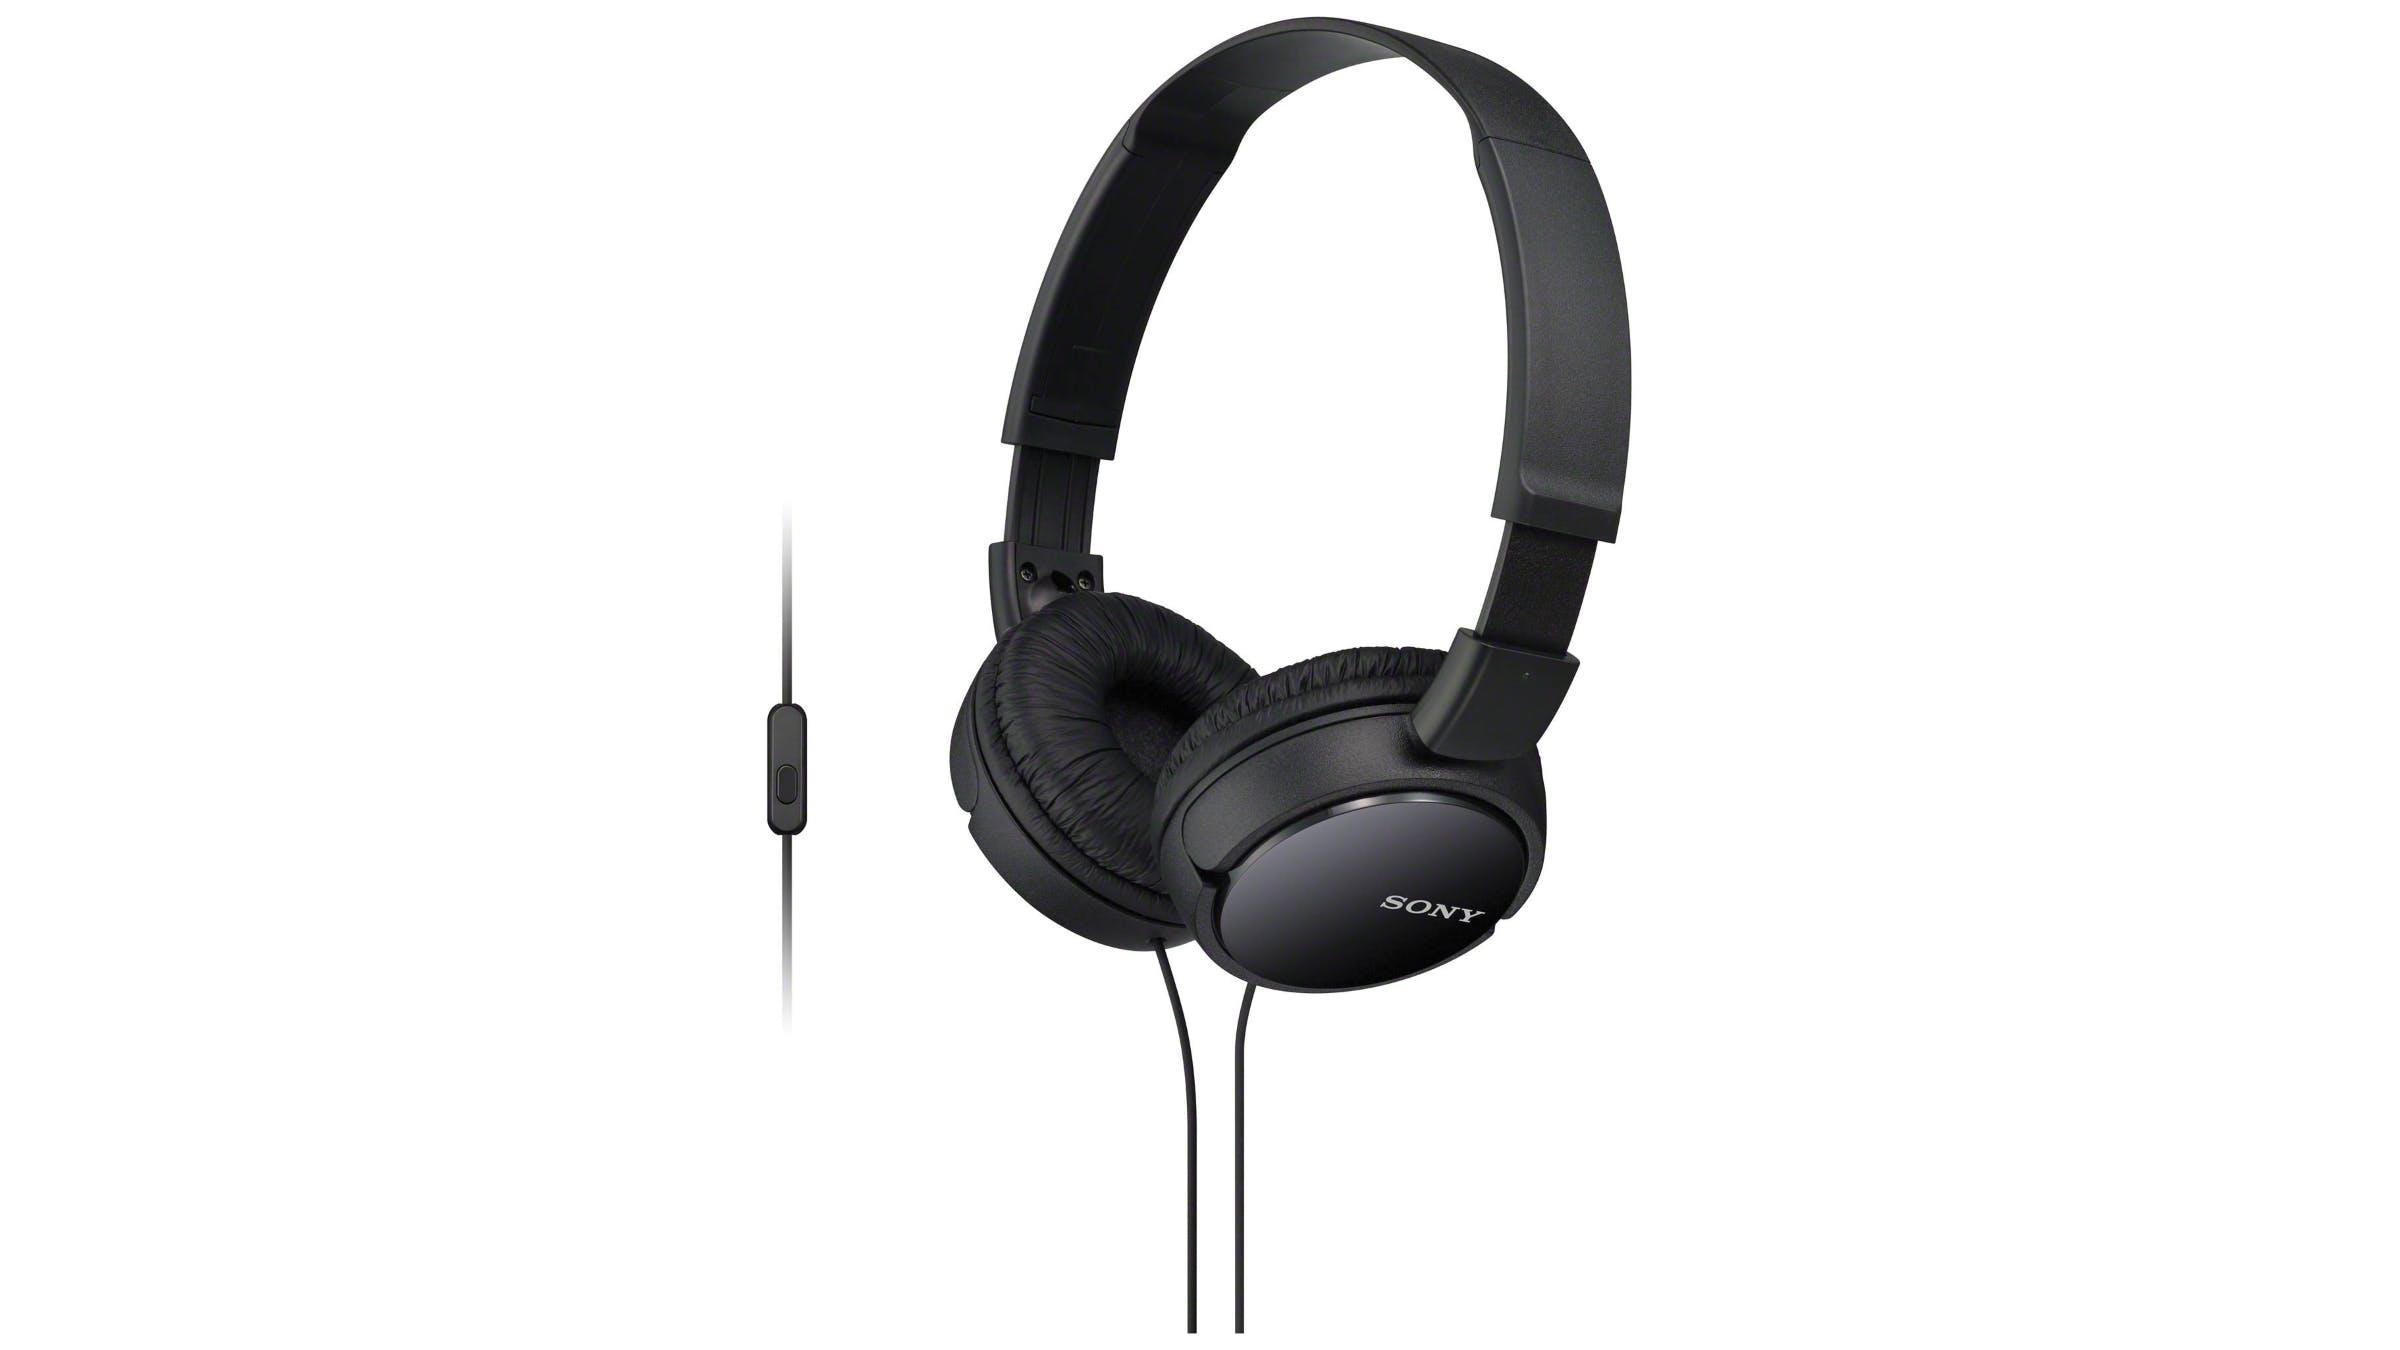 Headphones Harvey Norman Malaysia Bluedio Ufo Premium Wireless Bluetooth Headset High End Sony Mdrzx110ap On Ear Black